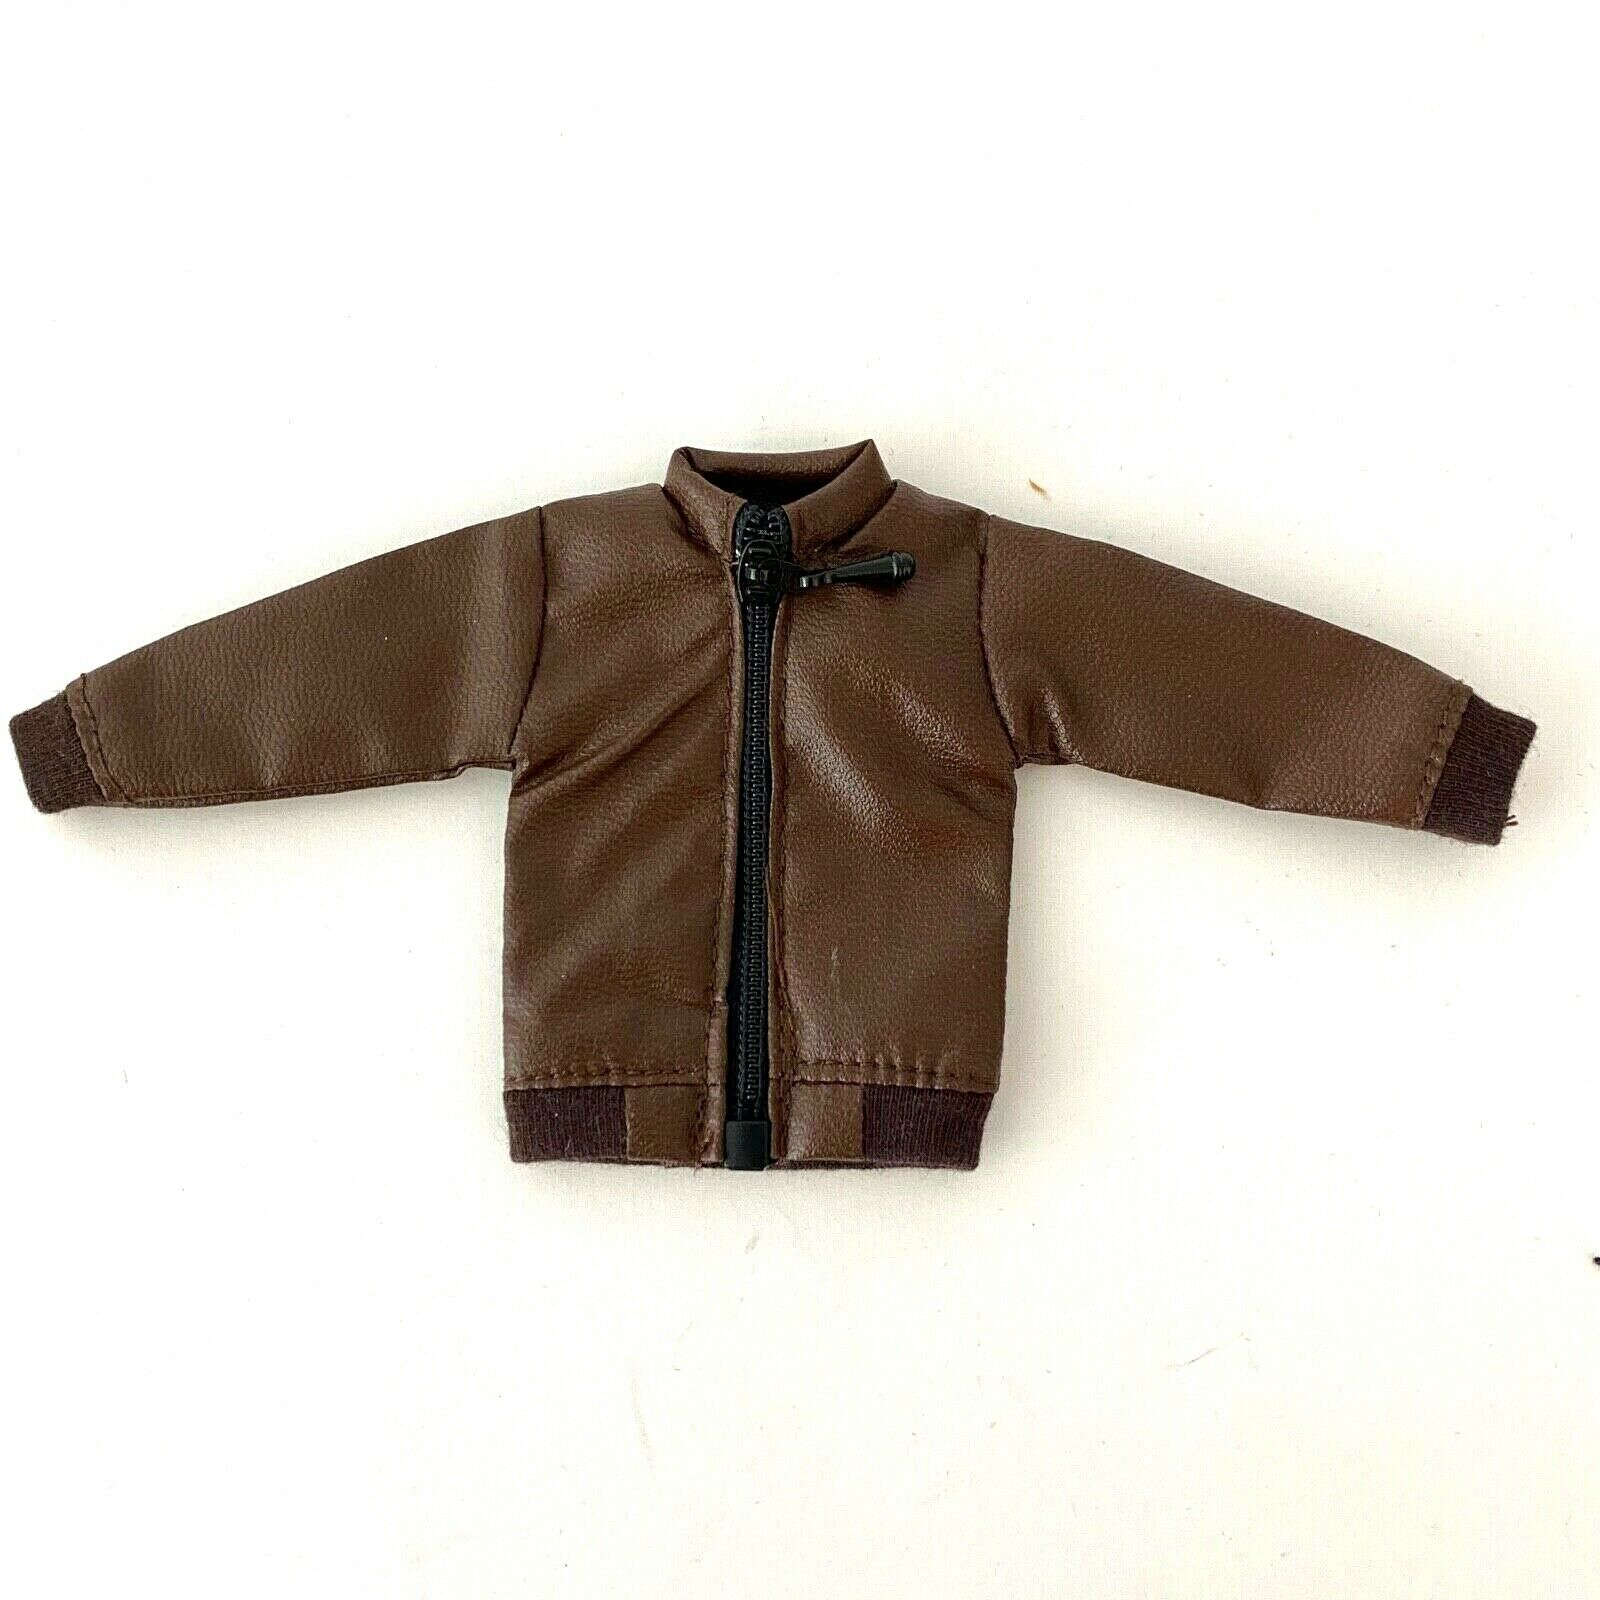 SU-ZPJK-TN: 1/12 Dark Brown Zipper Jacket for Mezco, Marvel Legends (No Figure) on eBay thumbnail